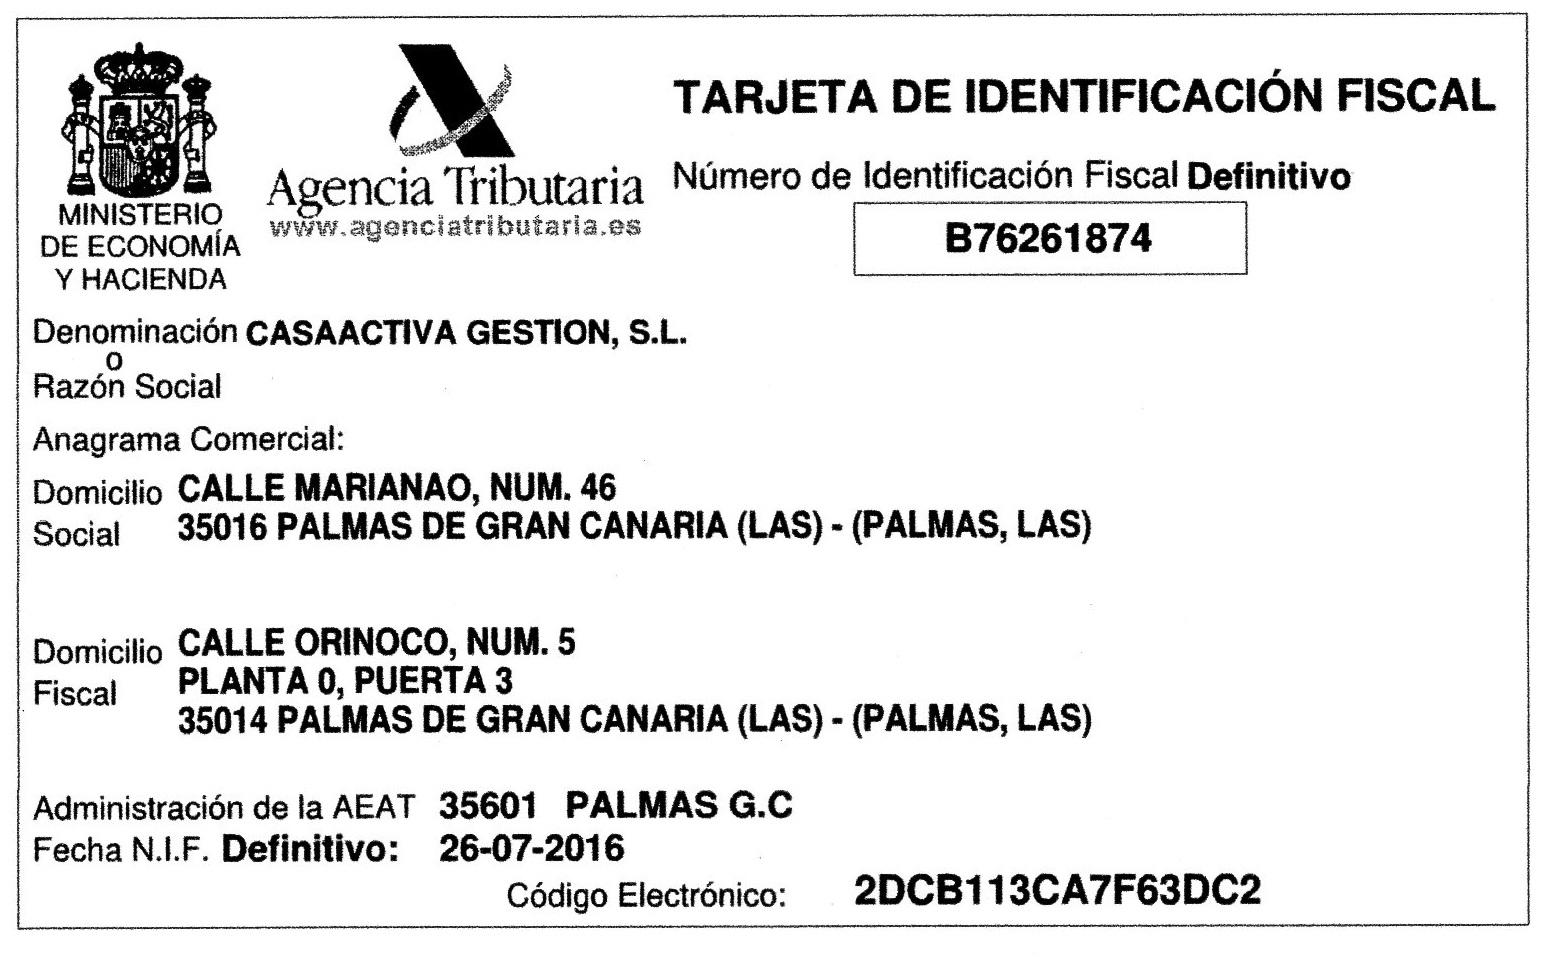 22-01-19 TARJETA IDENTIFICACIÓN FISCAL